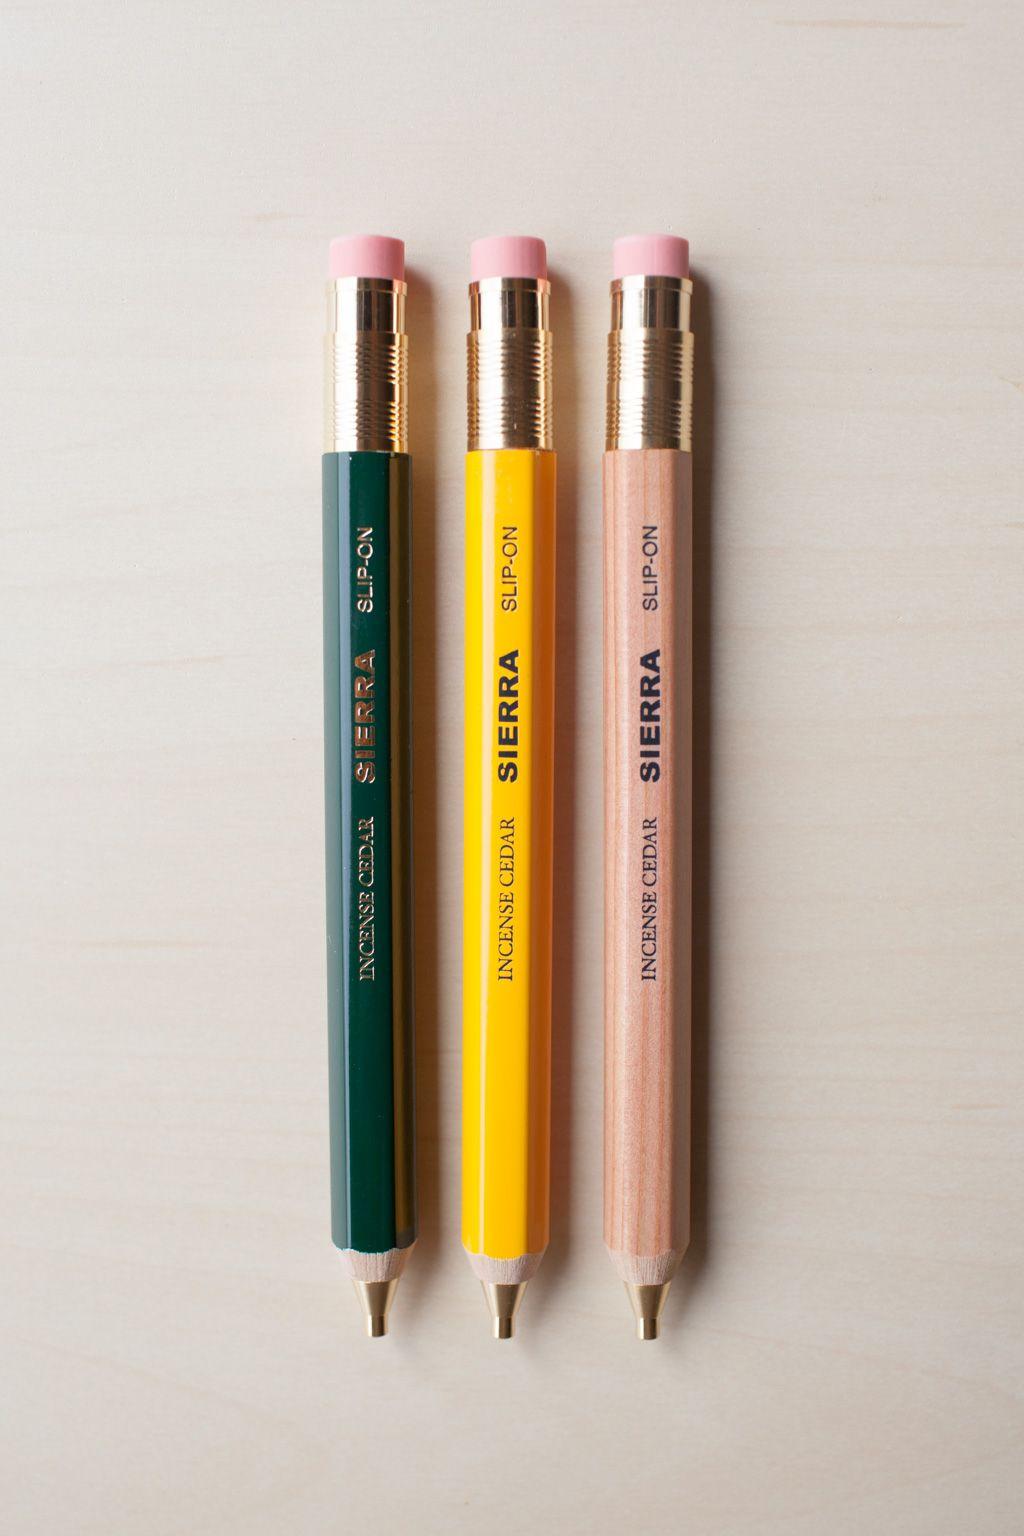 Blue Button Shop - Sierra Wooden HB Mechanical Pencil - SLI15NSTAUMUL103281